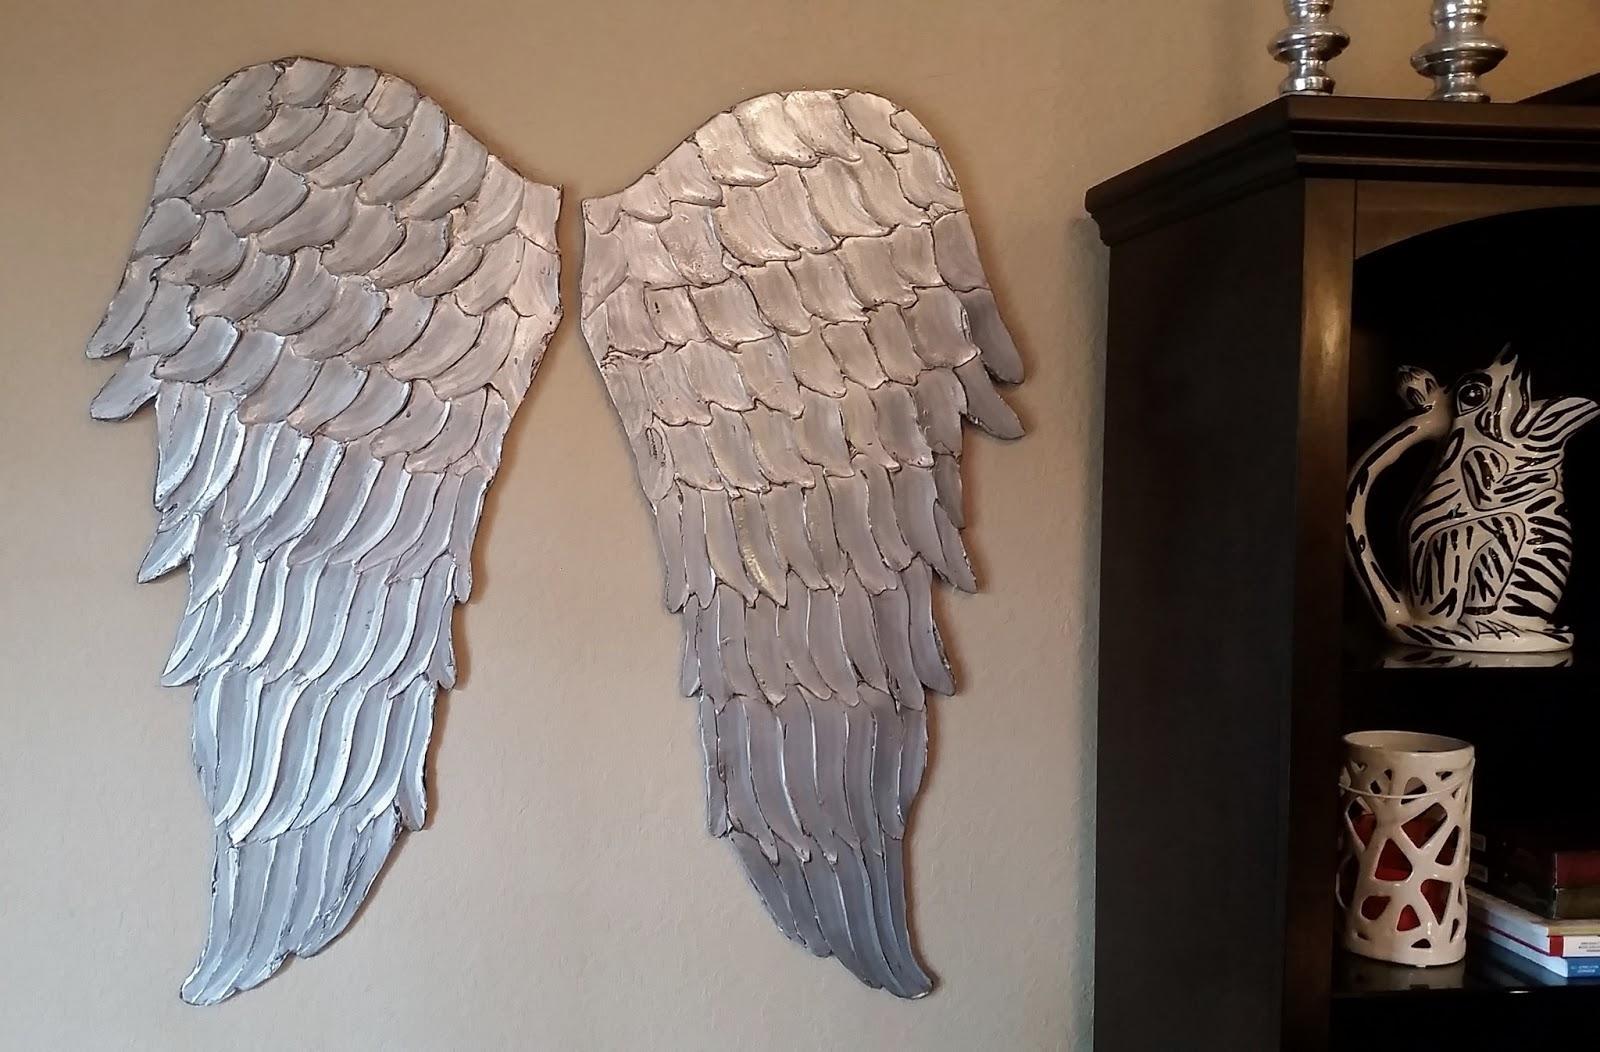 Wood Angel Wings Wall Art, Large Carved Look Wooden Angel Wings Throughout Angel Wing Wall Art (View 2 of 20)